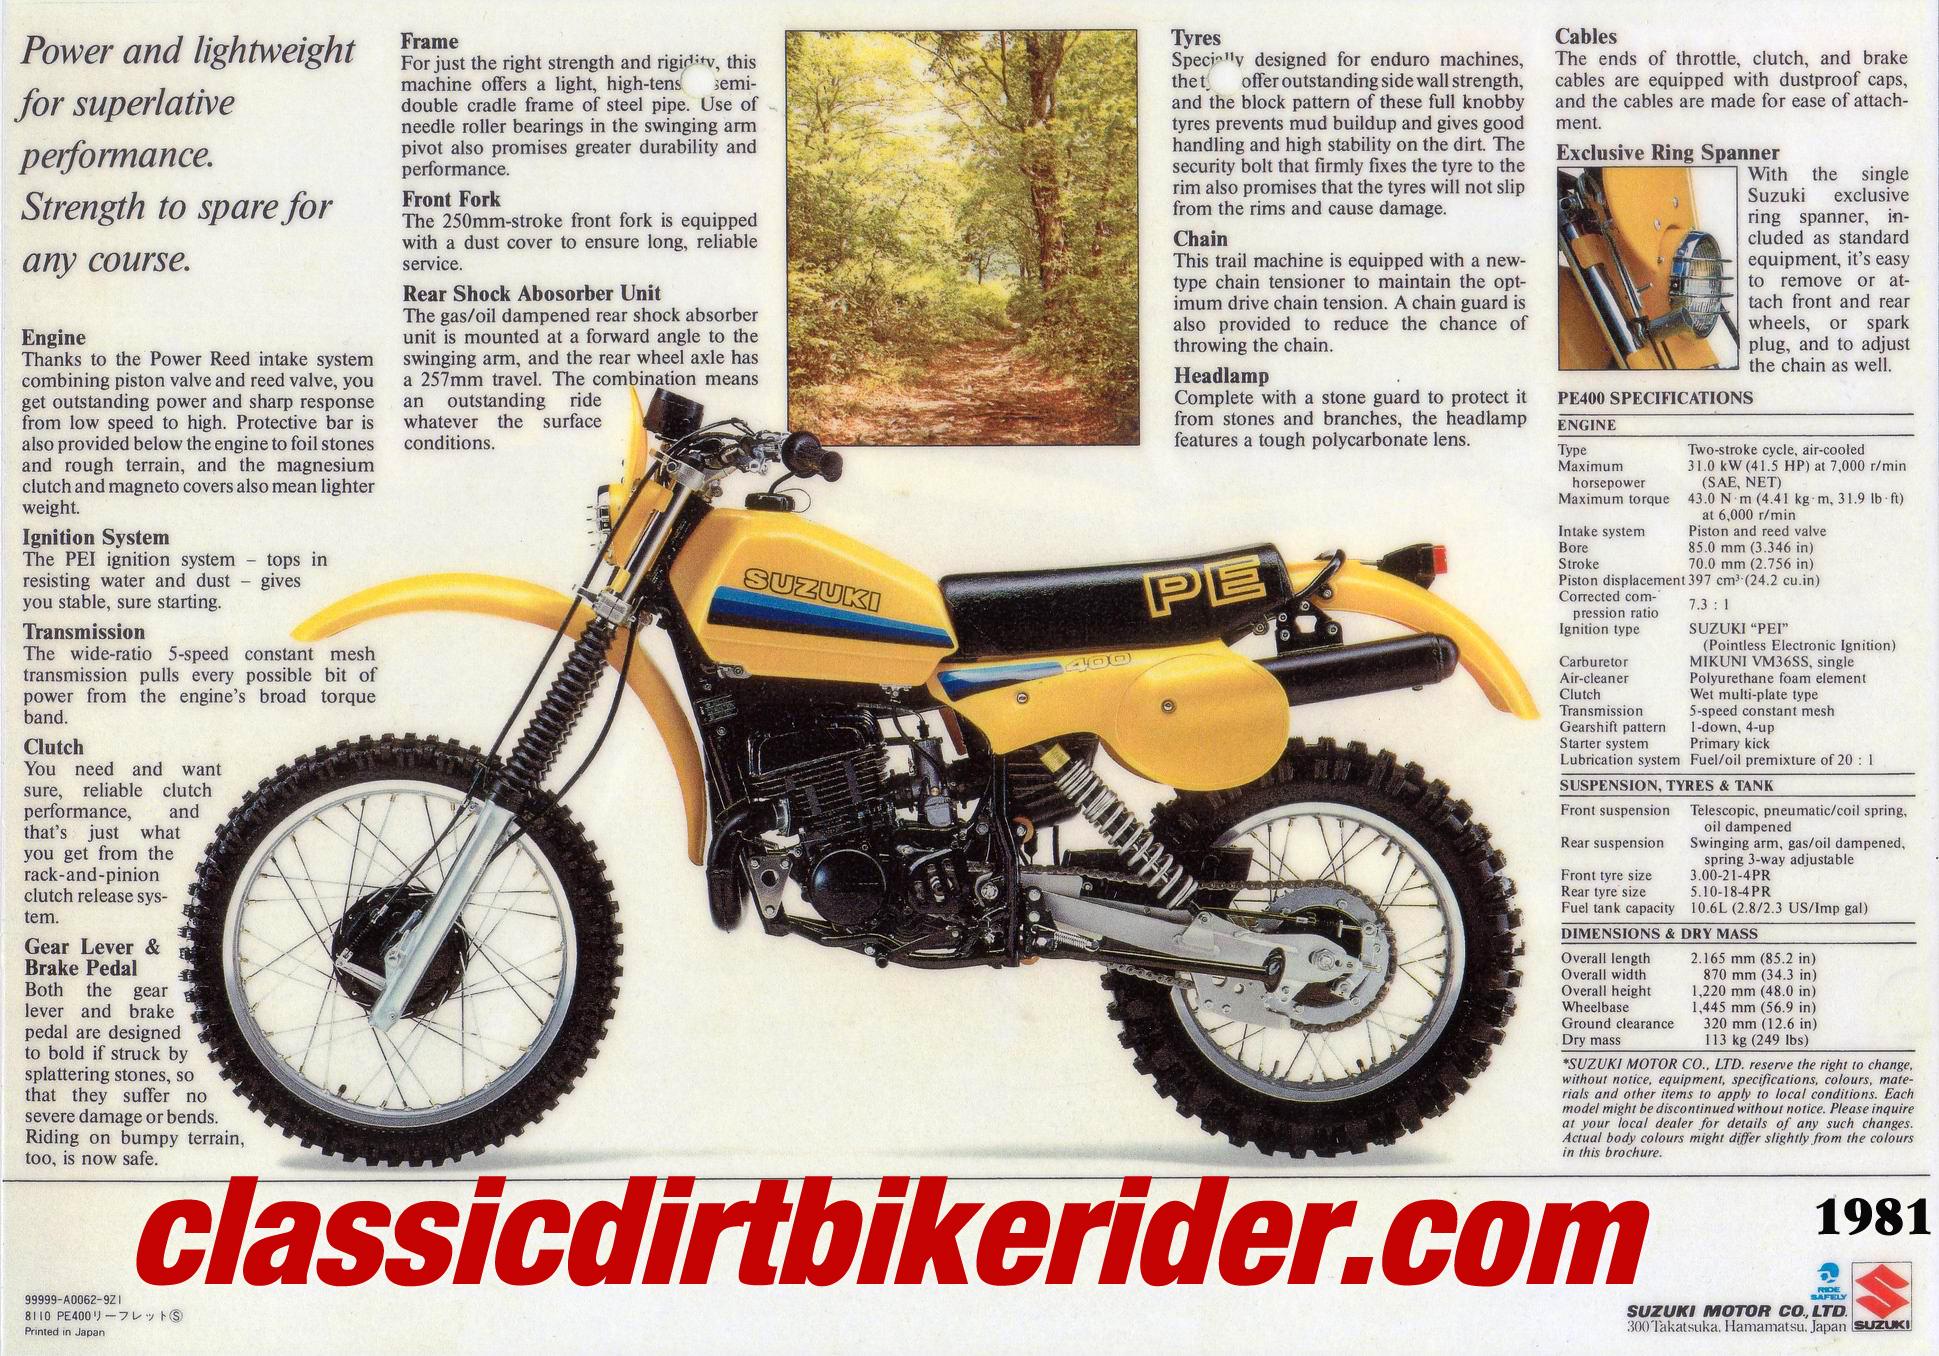 1981 SUZUKI PE400X ORIGINAL ADVERT www.classicdirtbikerider.com